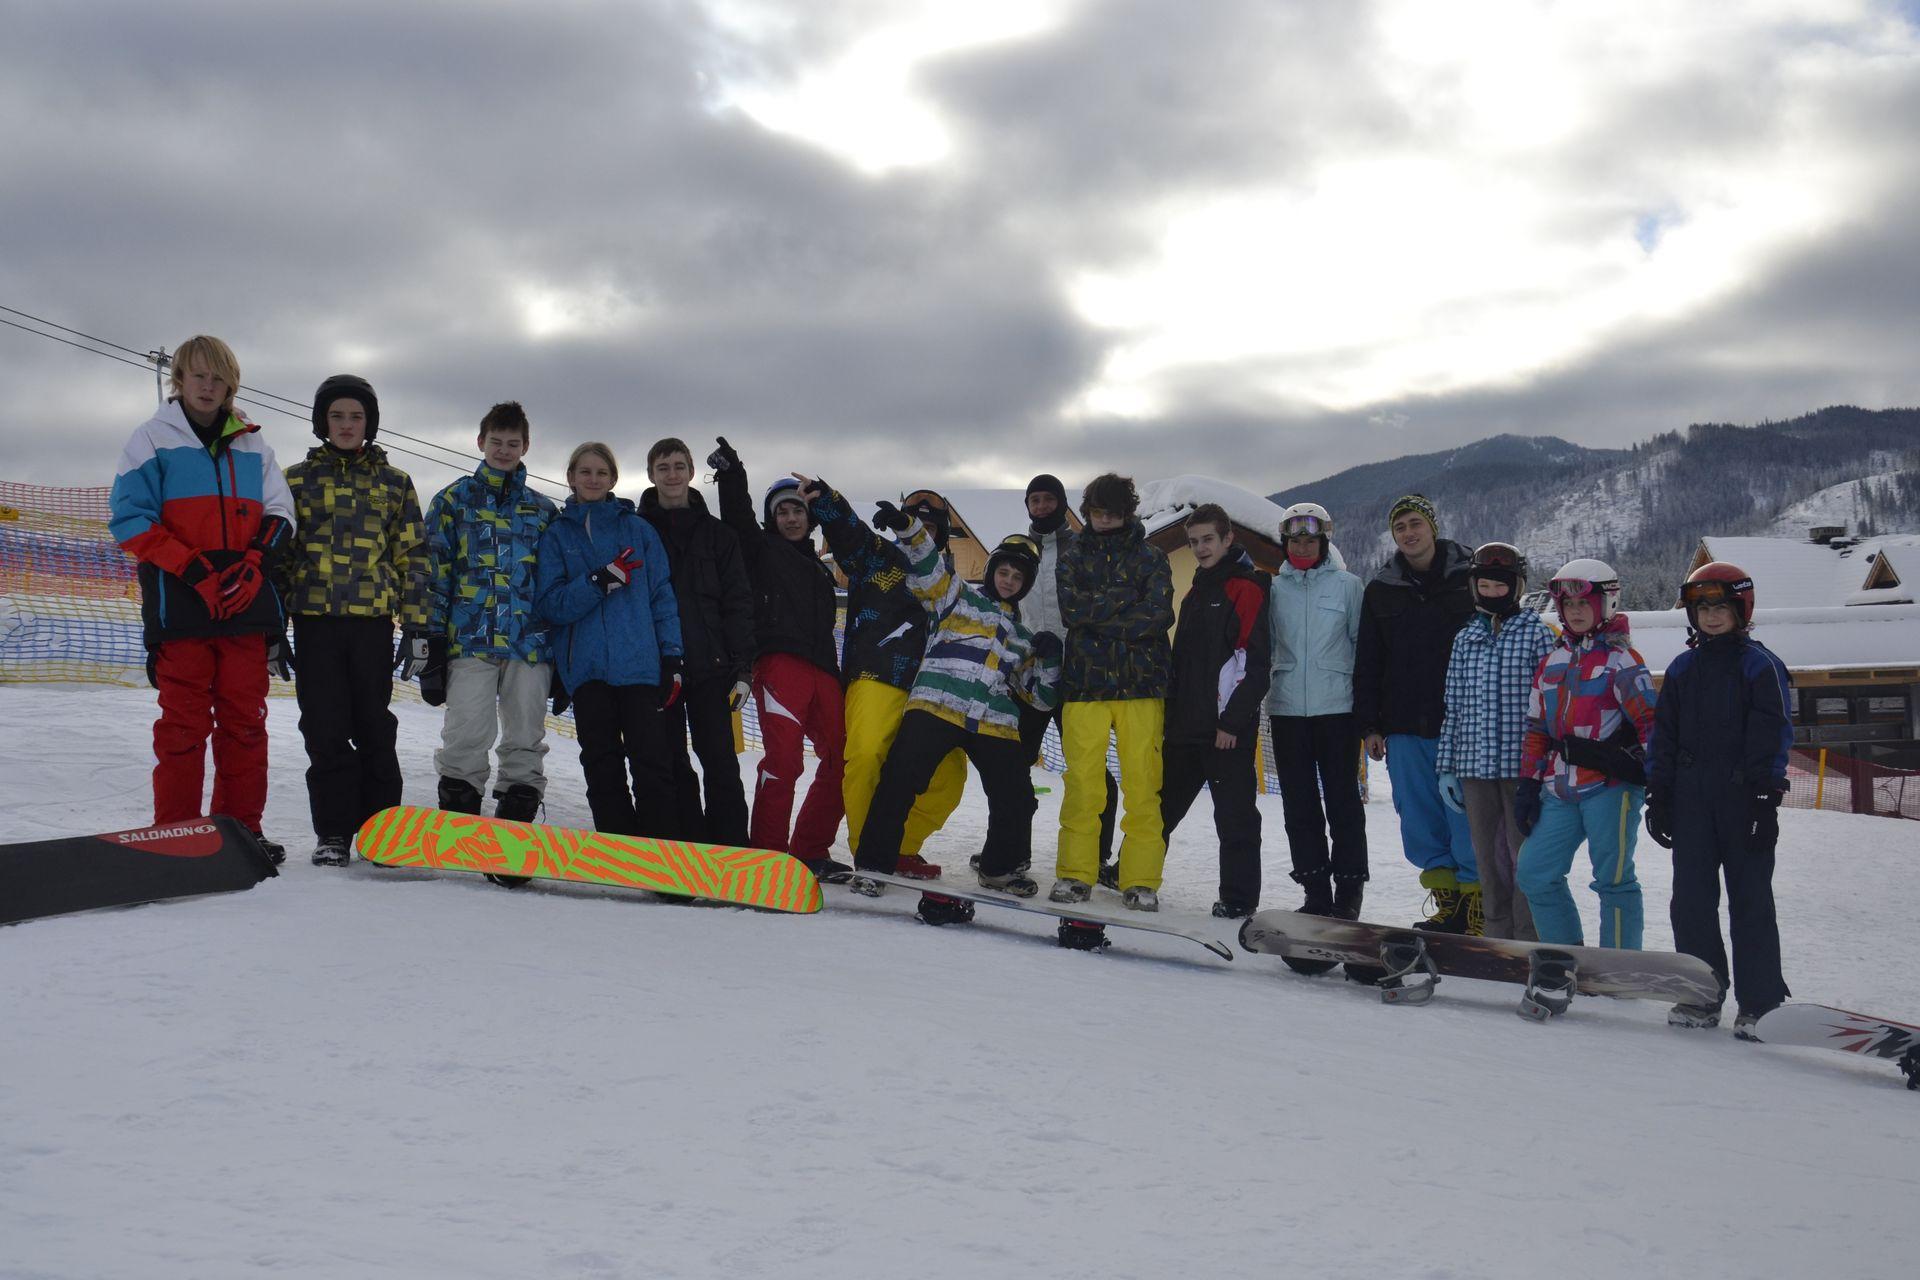 CarTourist_narty-snowboard_2013-foto-2